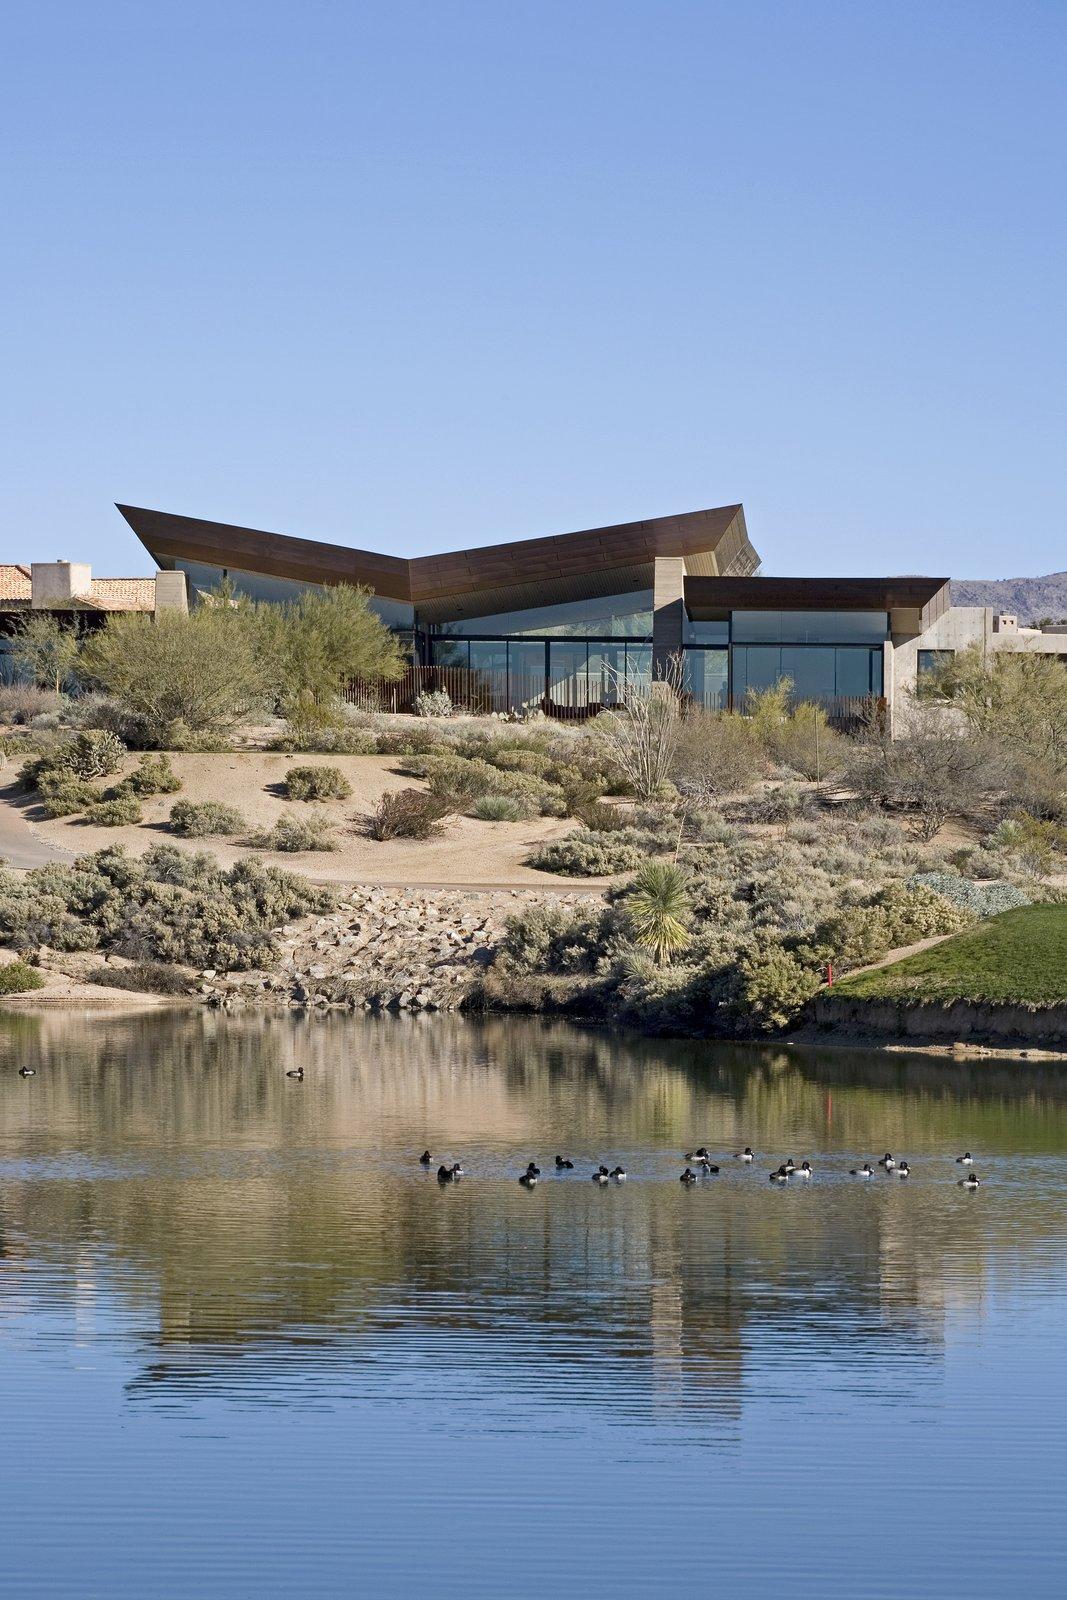 Exterior, House Building Type, Metal Roof Material, Concrete Siding Material, and Metal Siding Material  Desert Wing